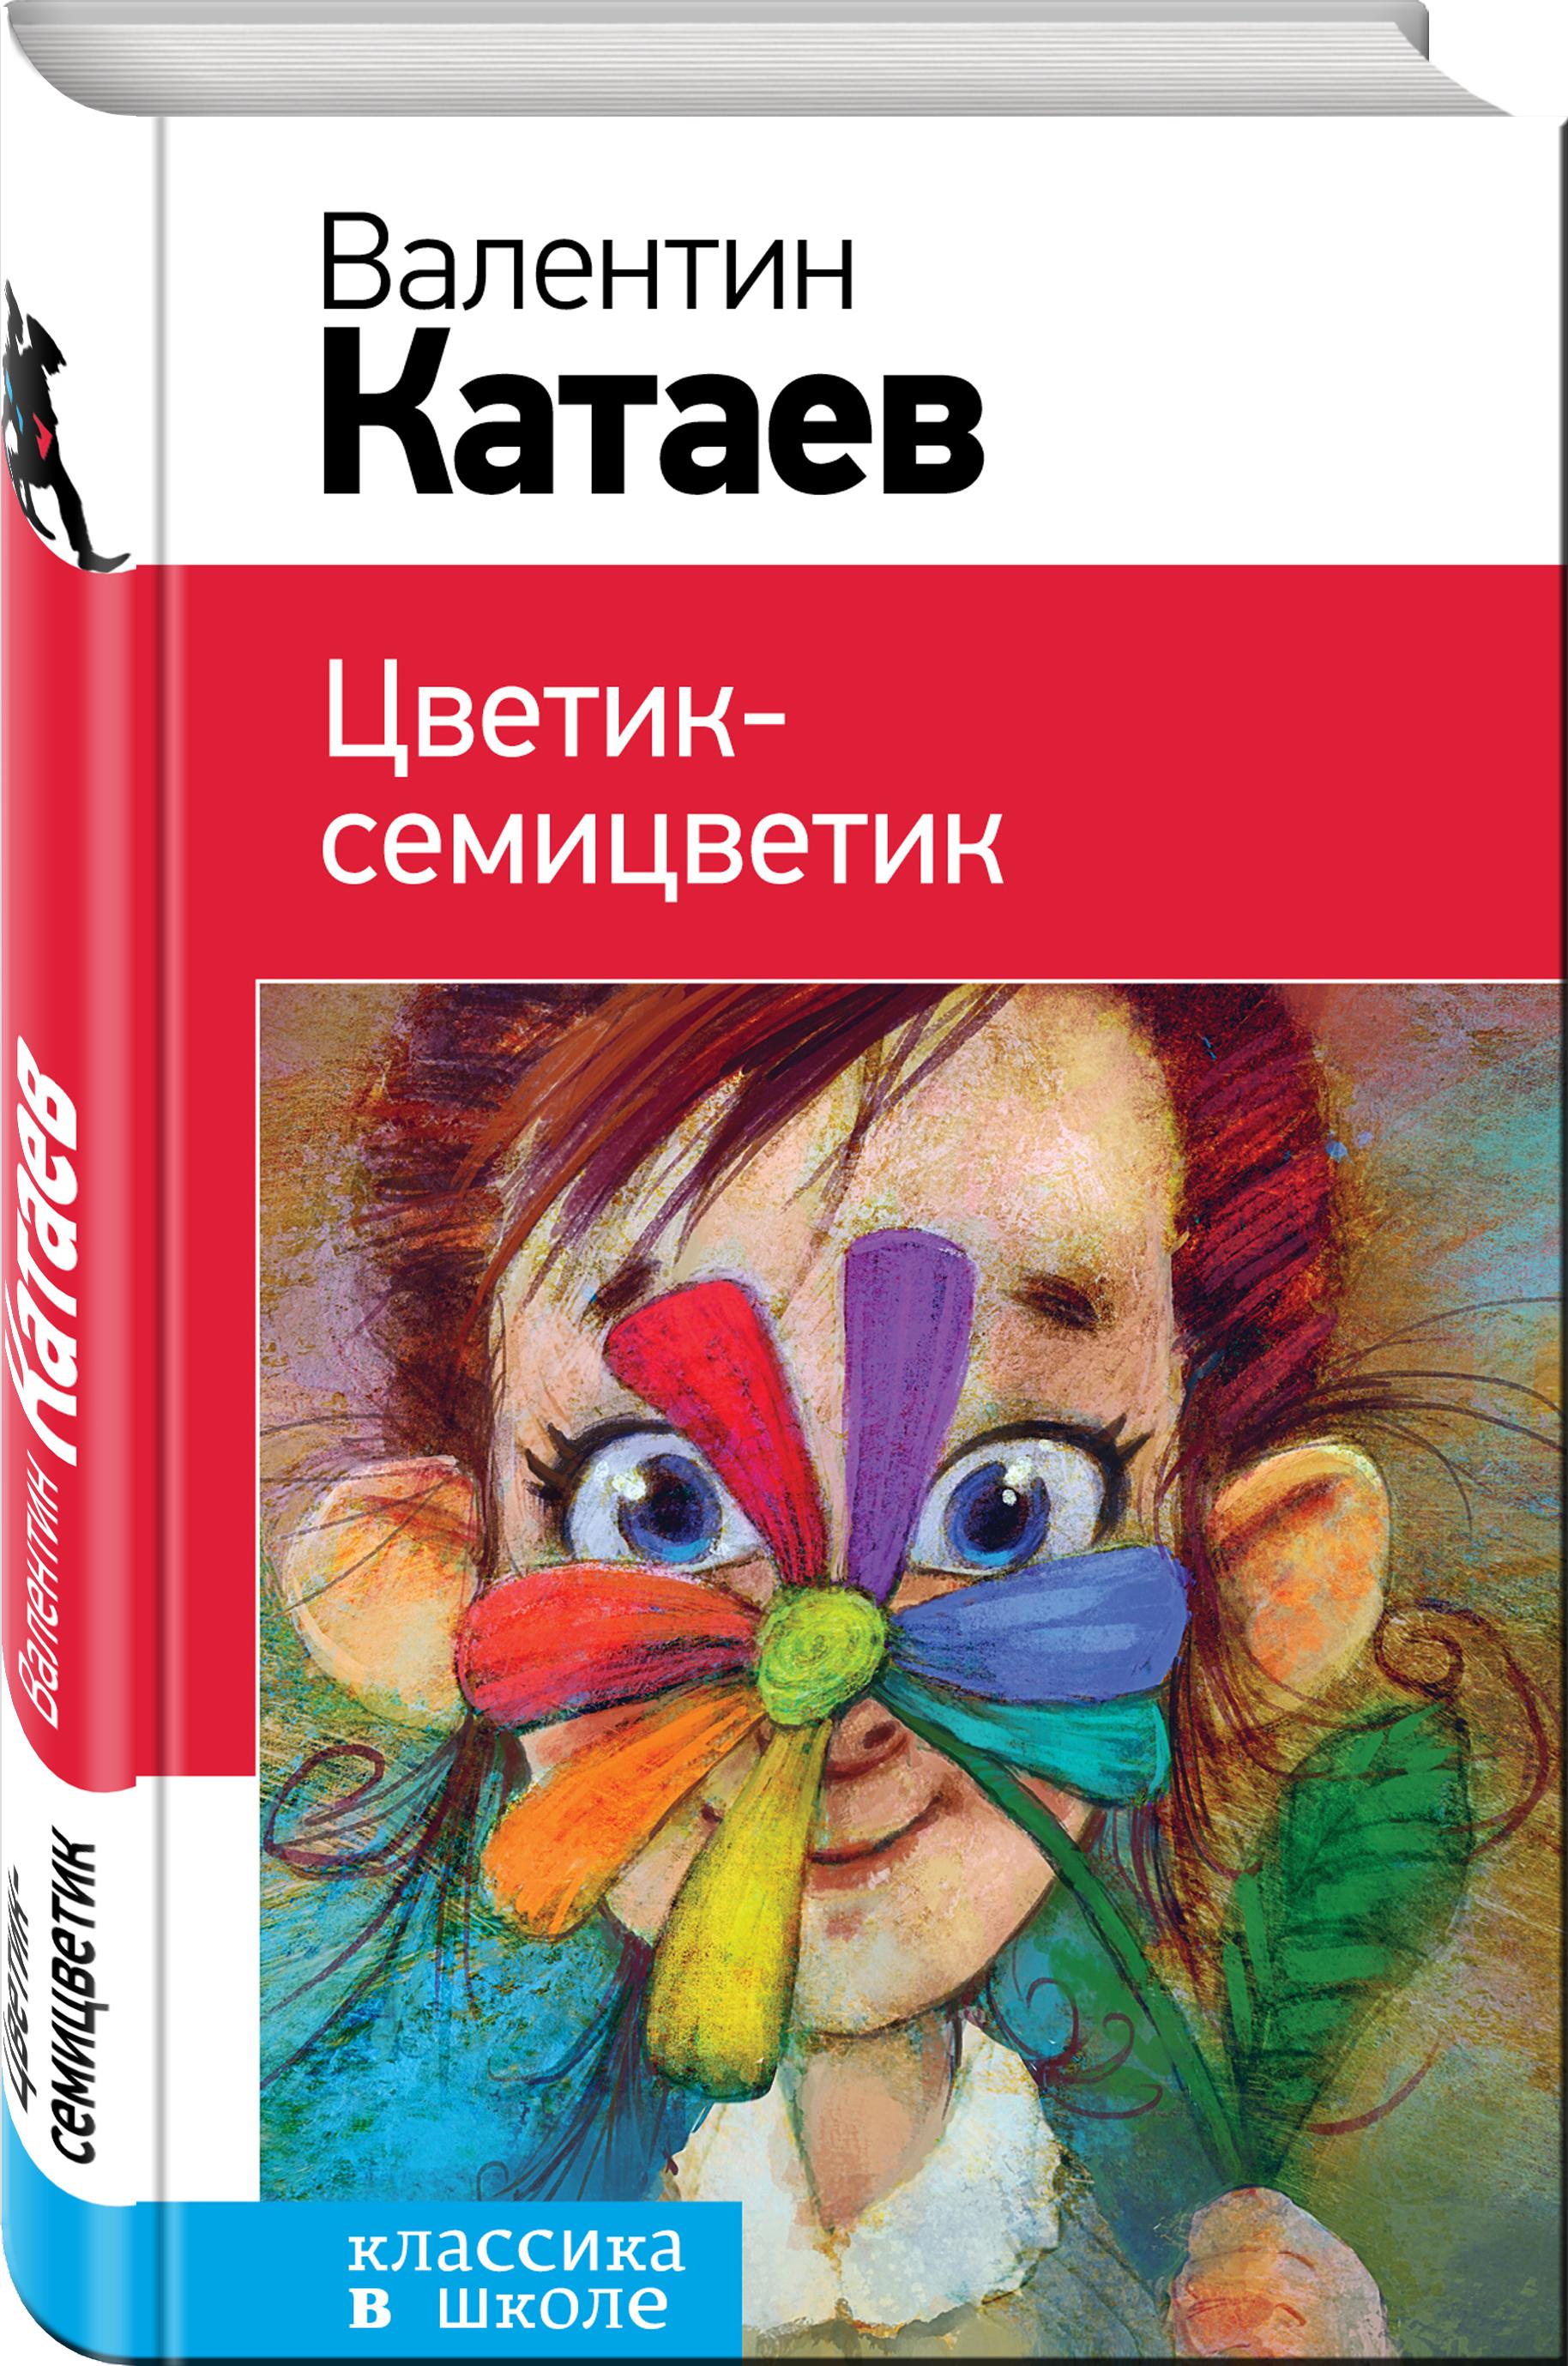 Валентин Катаев Цветик-семицветик валентин катаев горох в стенку